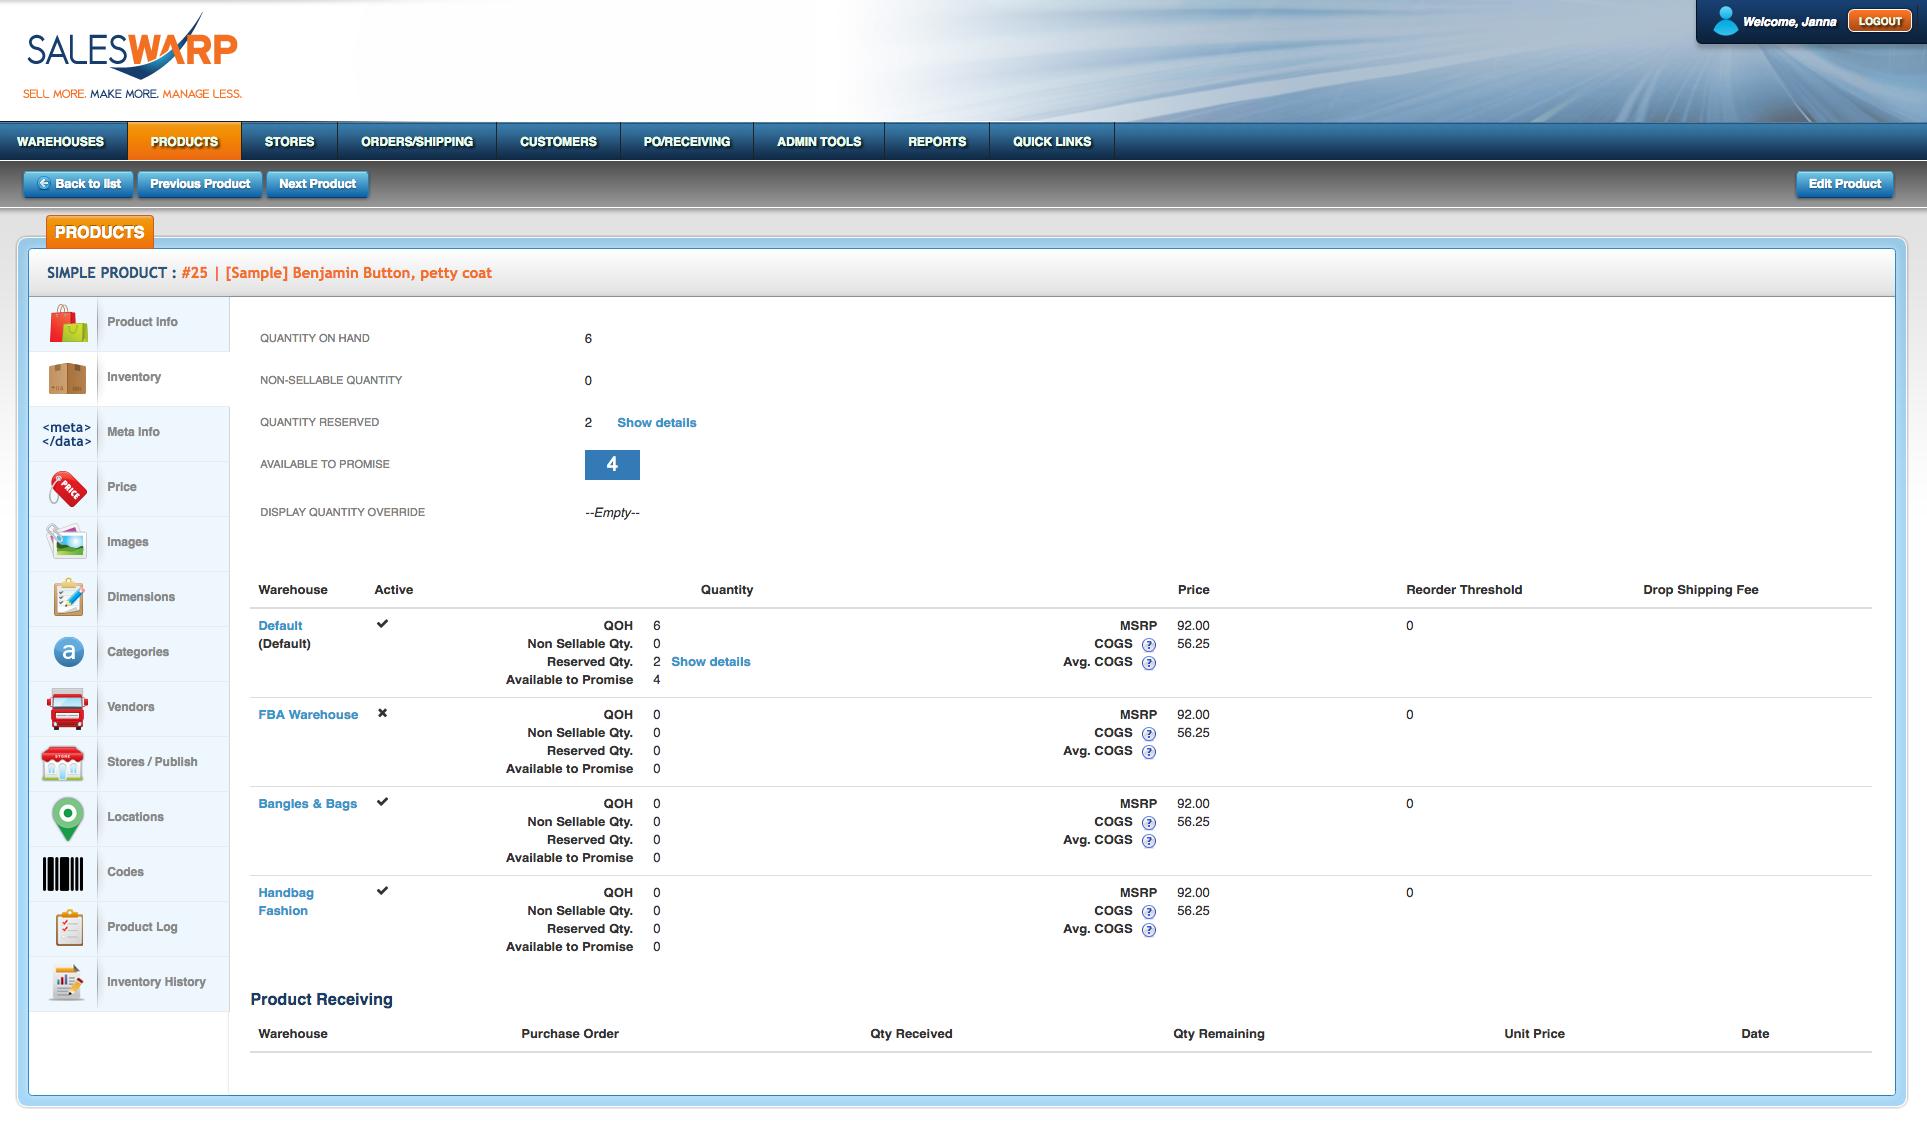 SalesWarp Demo - Inventory